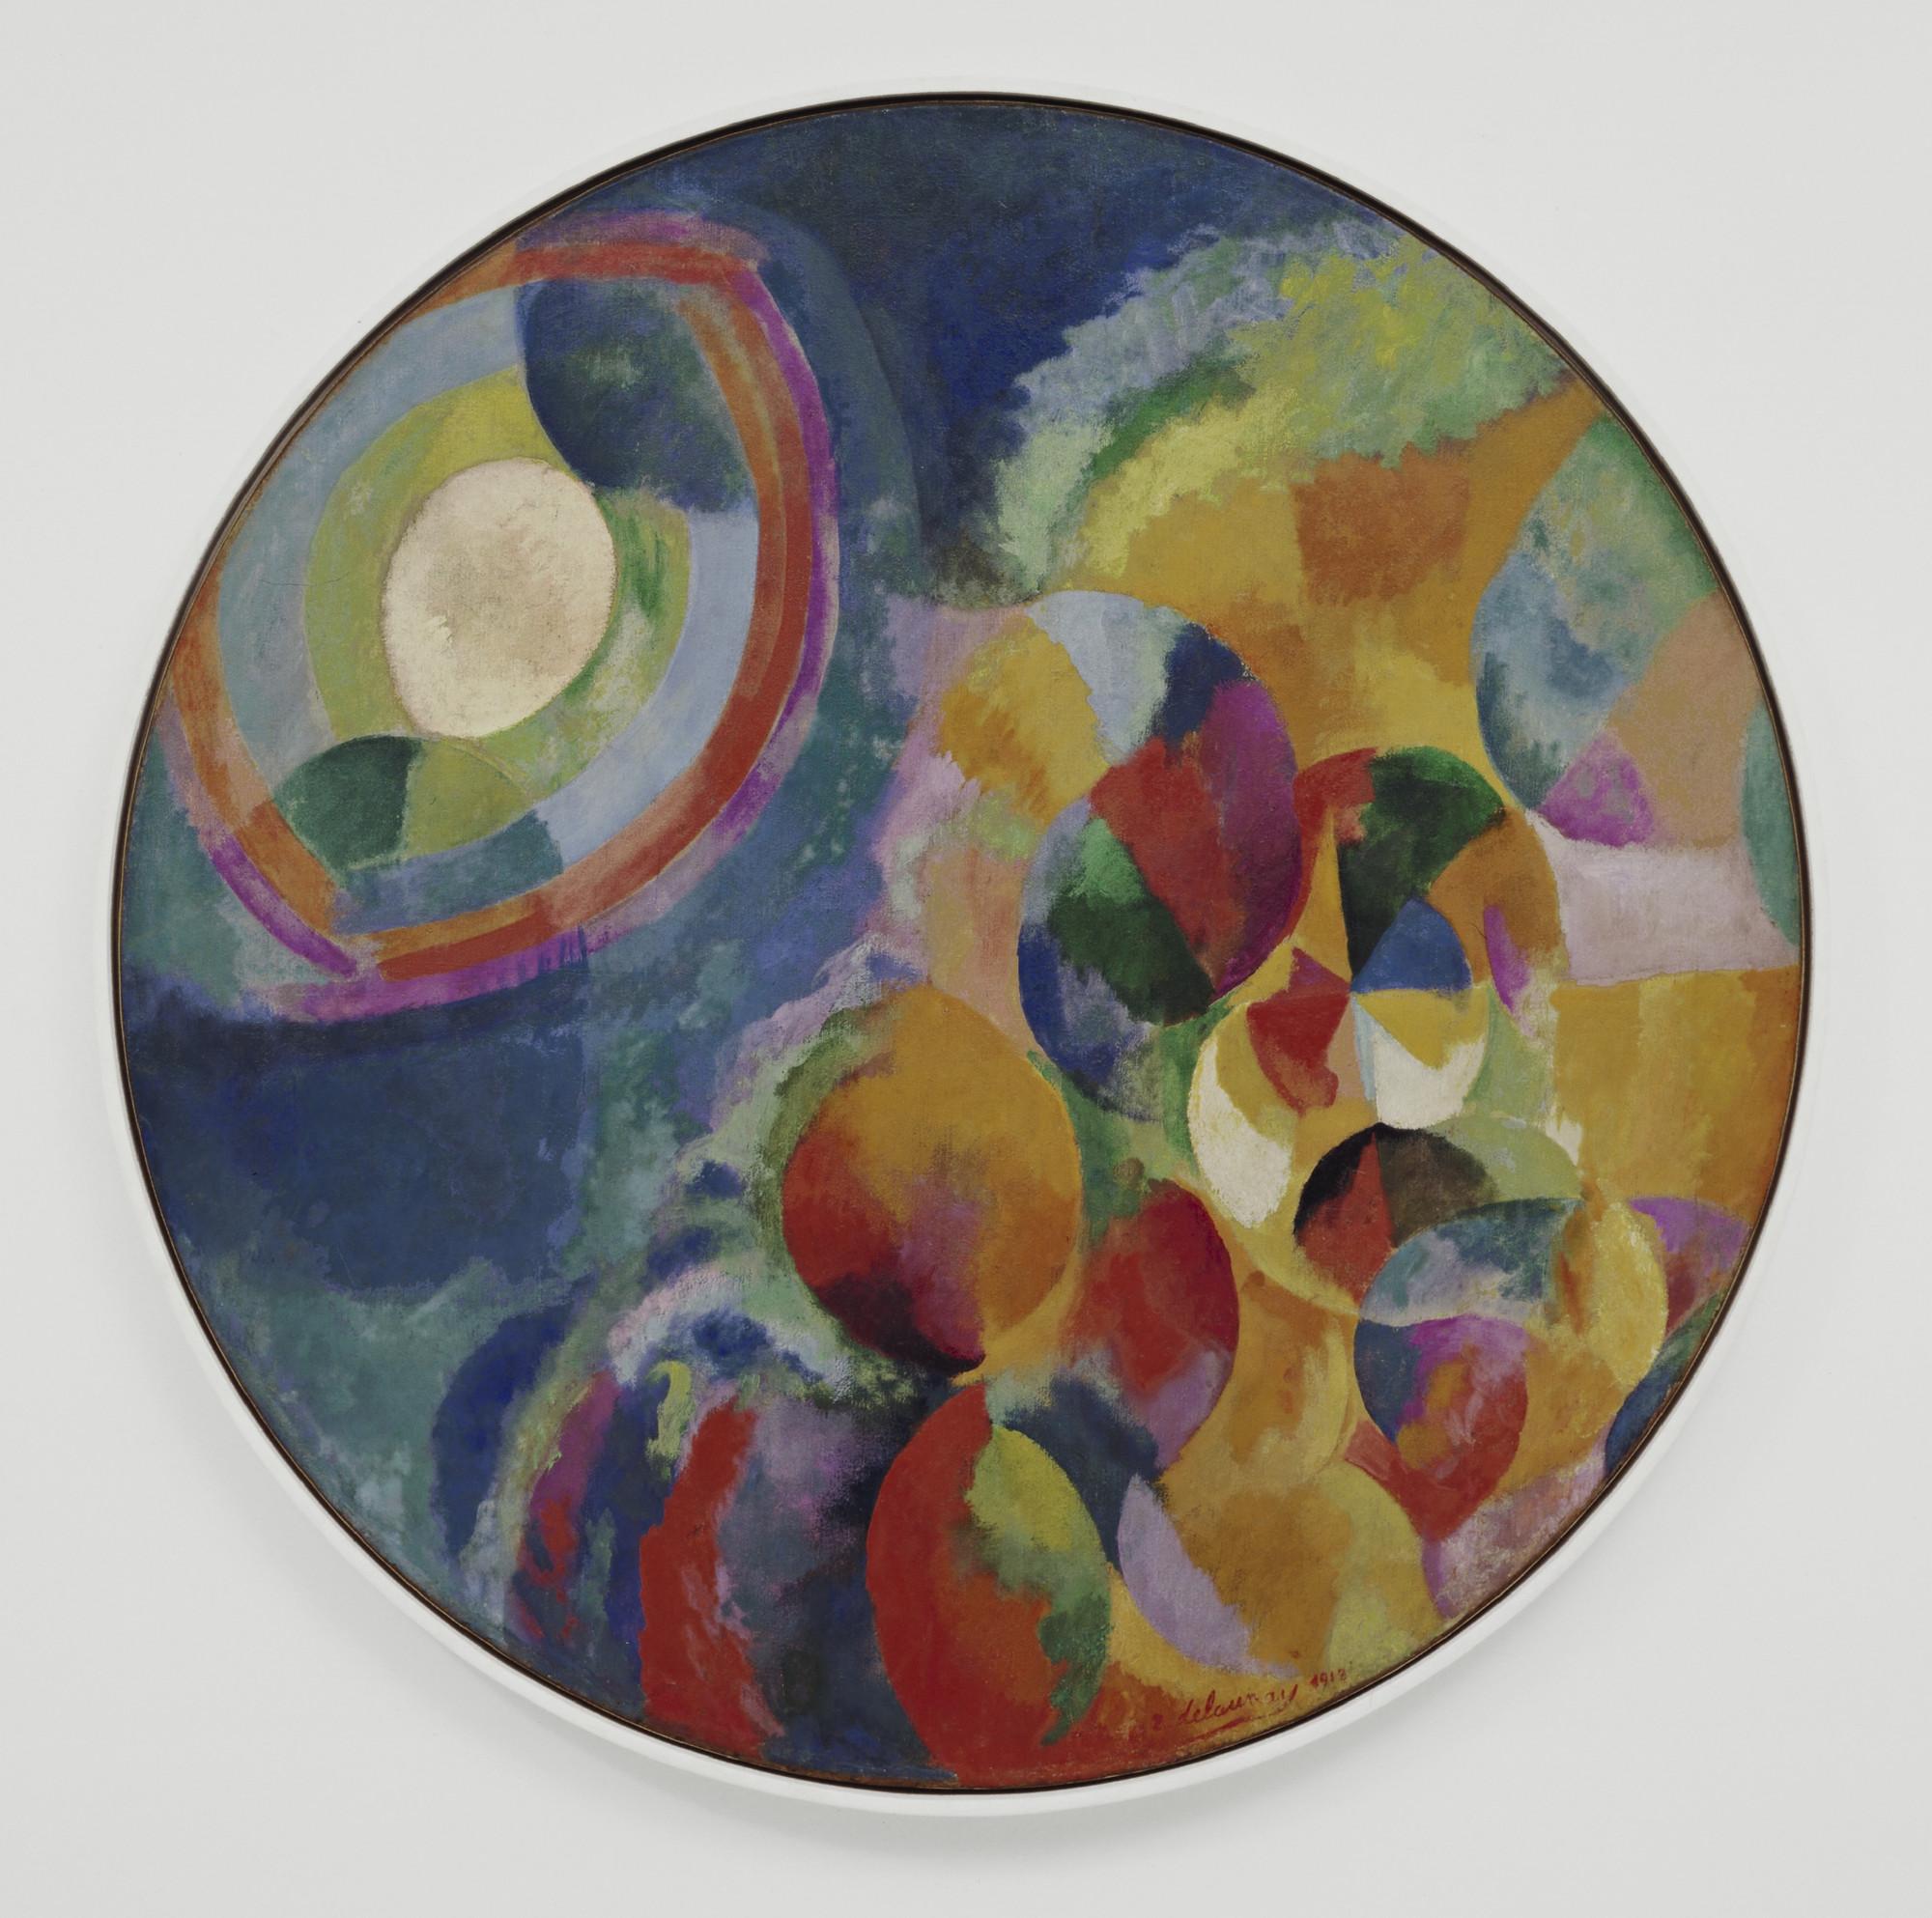 Robert Delaunay Simultaneous Contrasts Sun And Moon Paris 1913